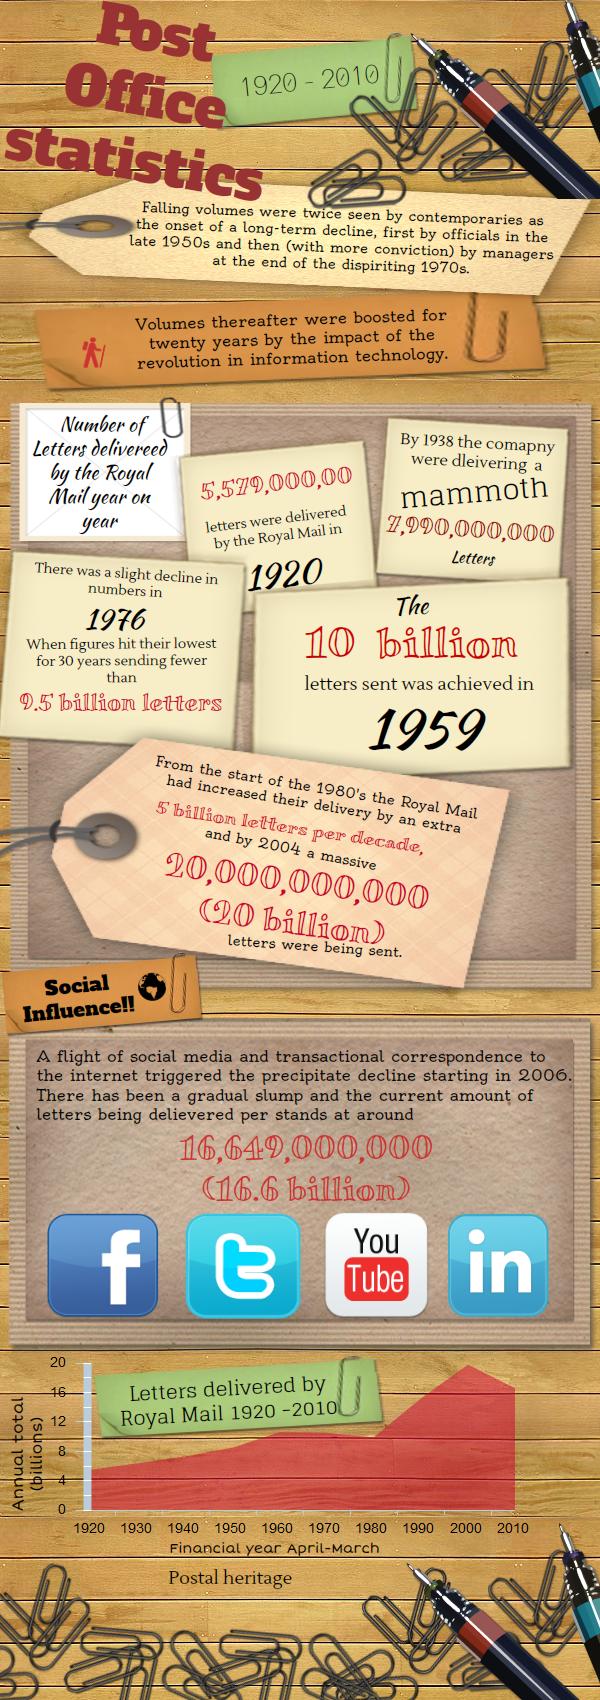 Post Office Statistics 1920 2010 Infographic